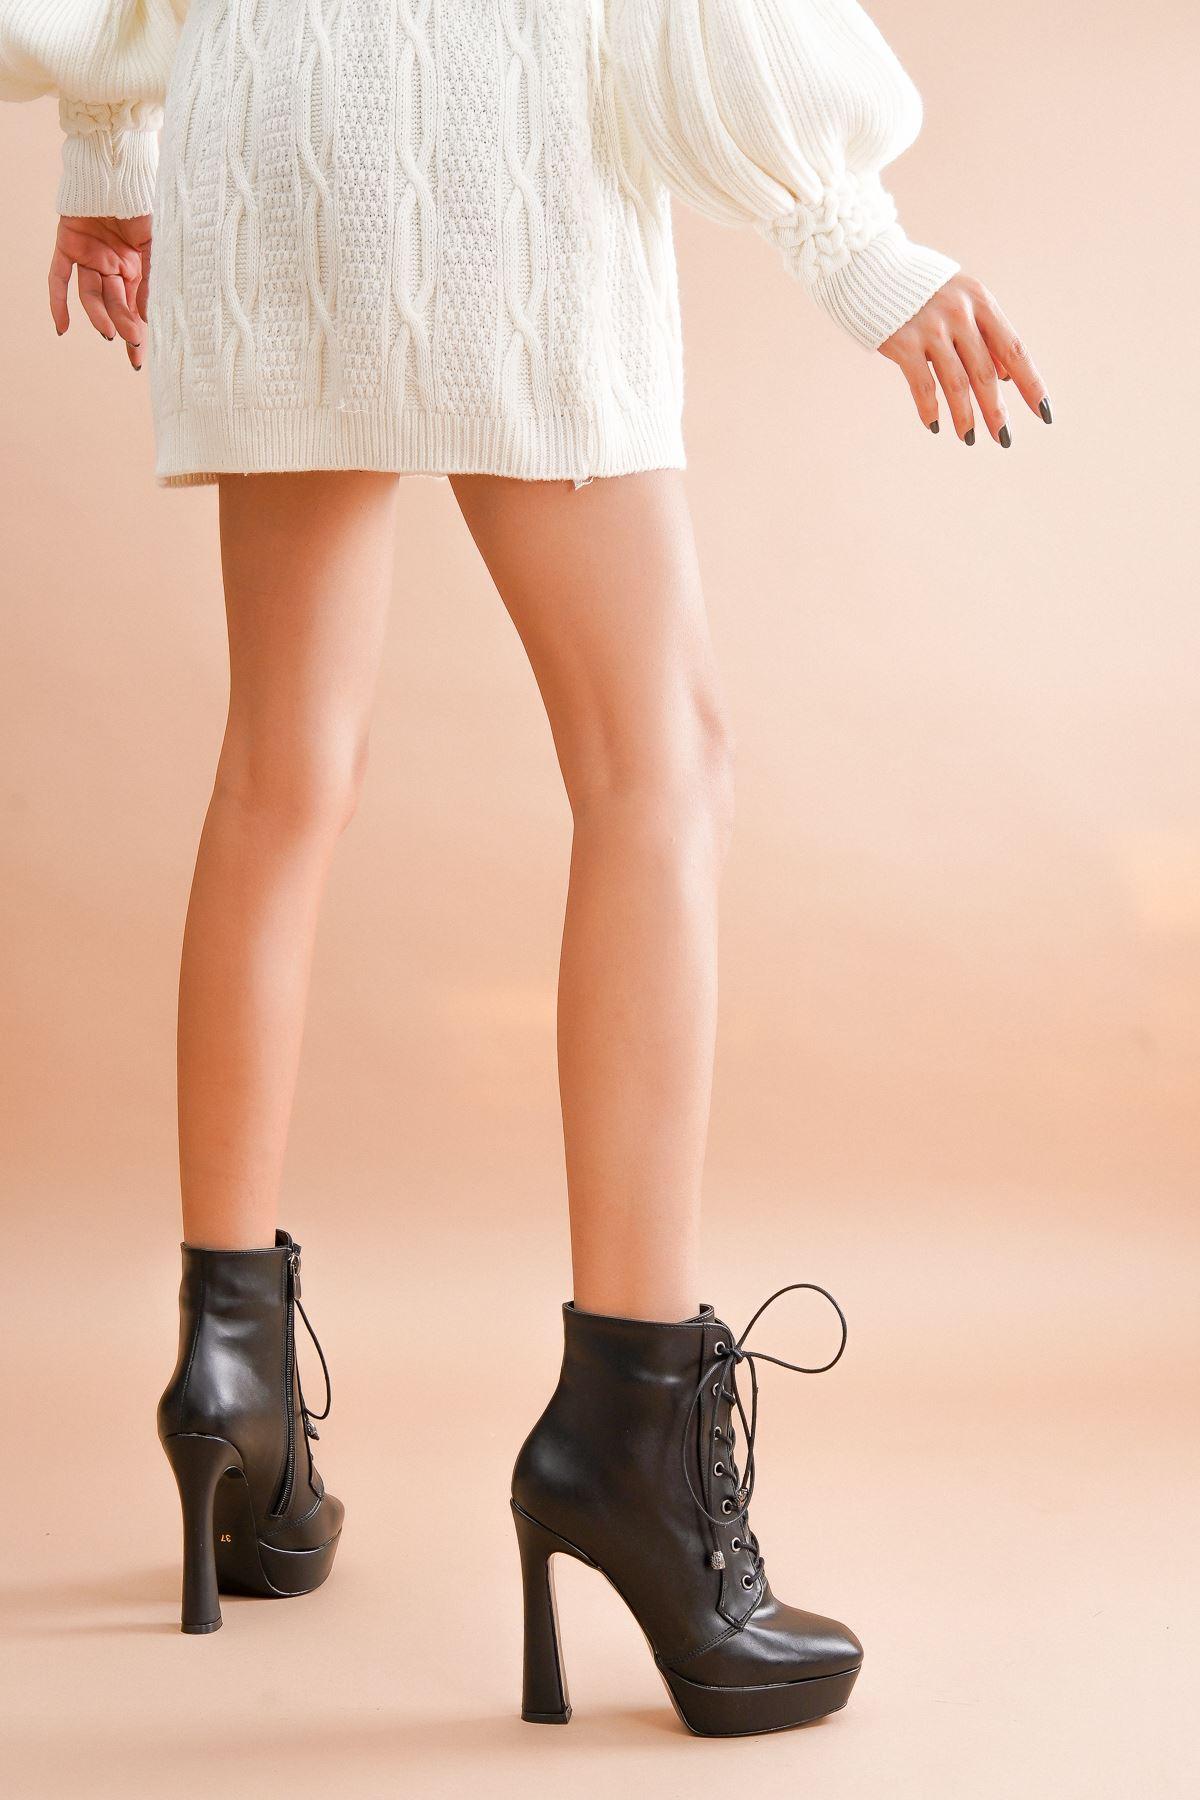 Viole Siyah Cilt Topuklu Kadın Bot